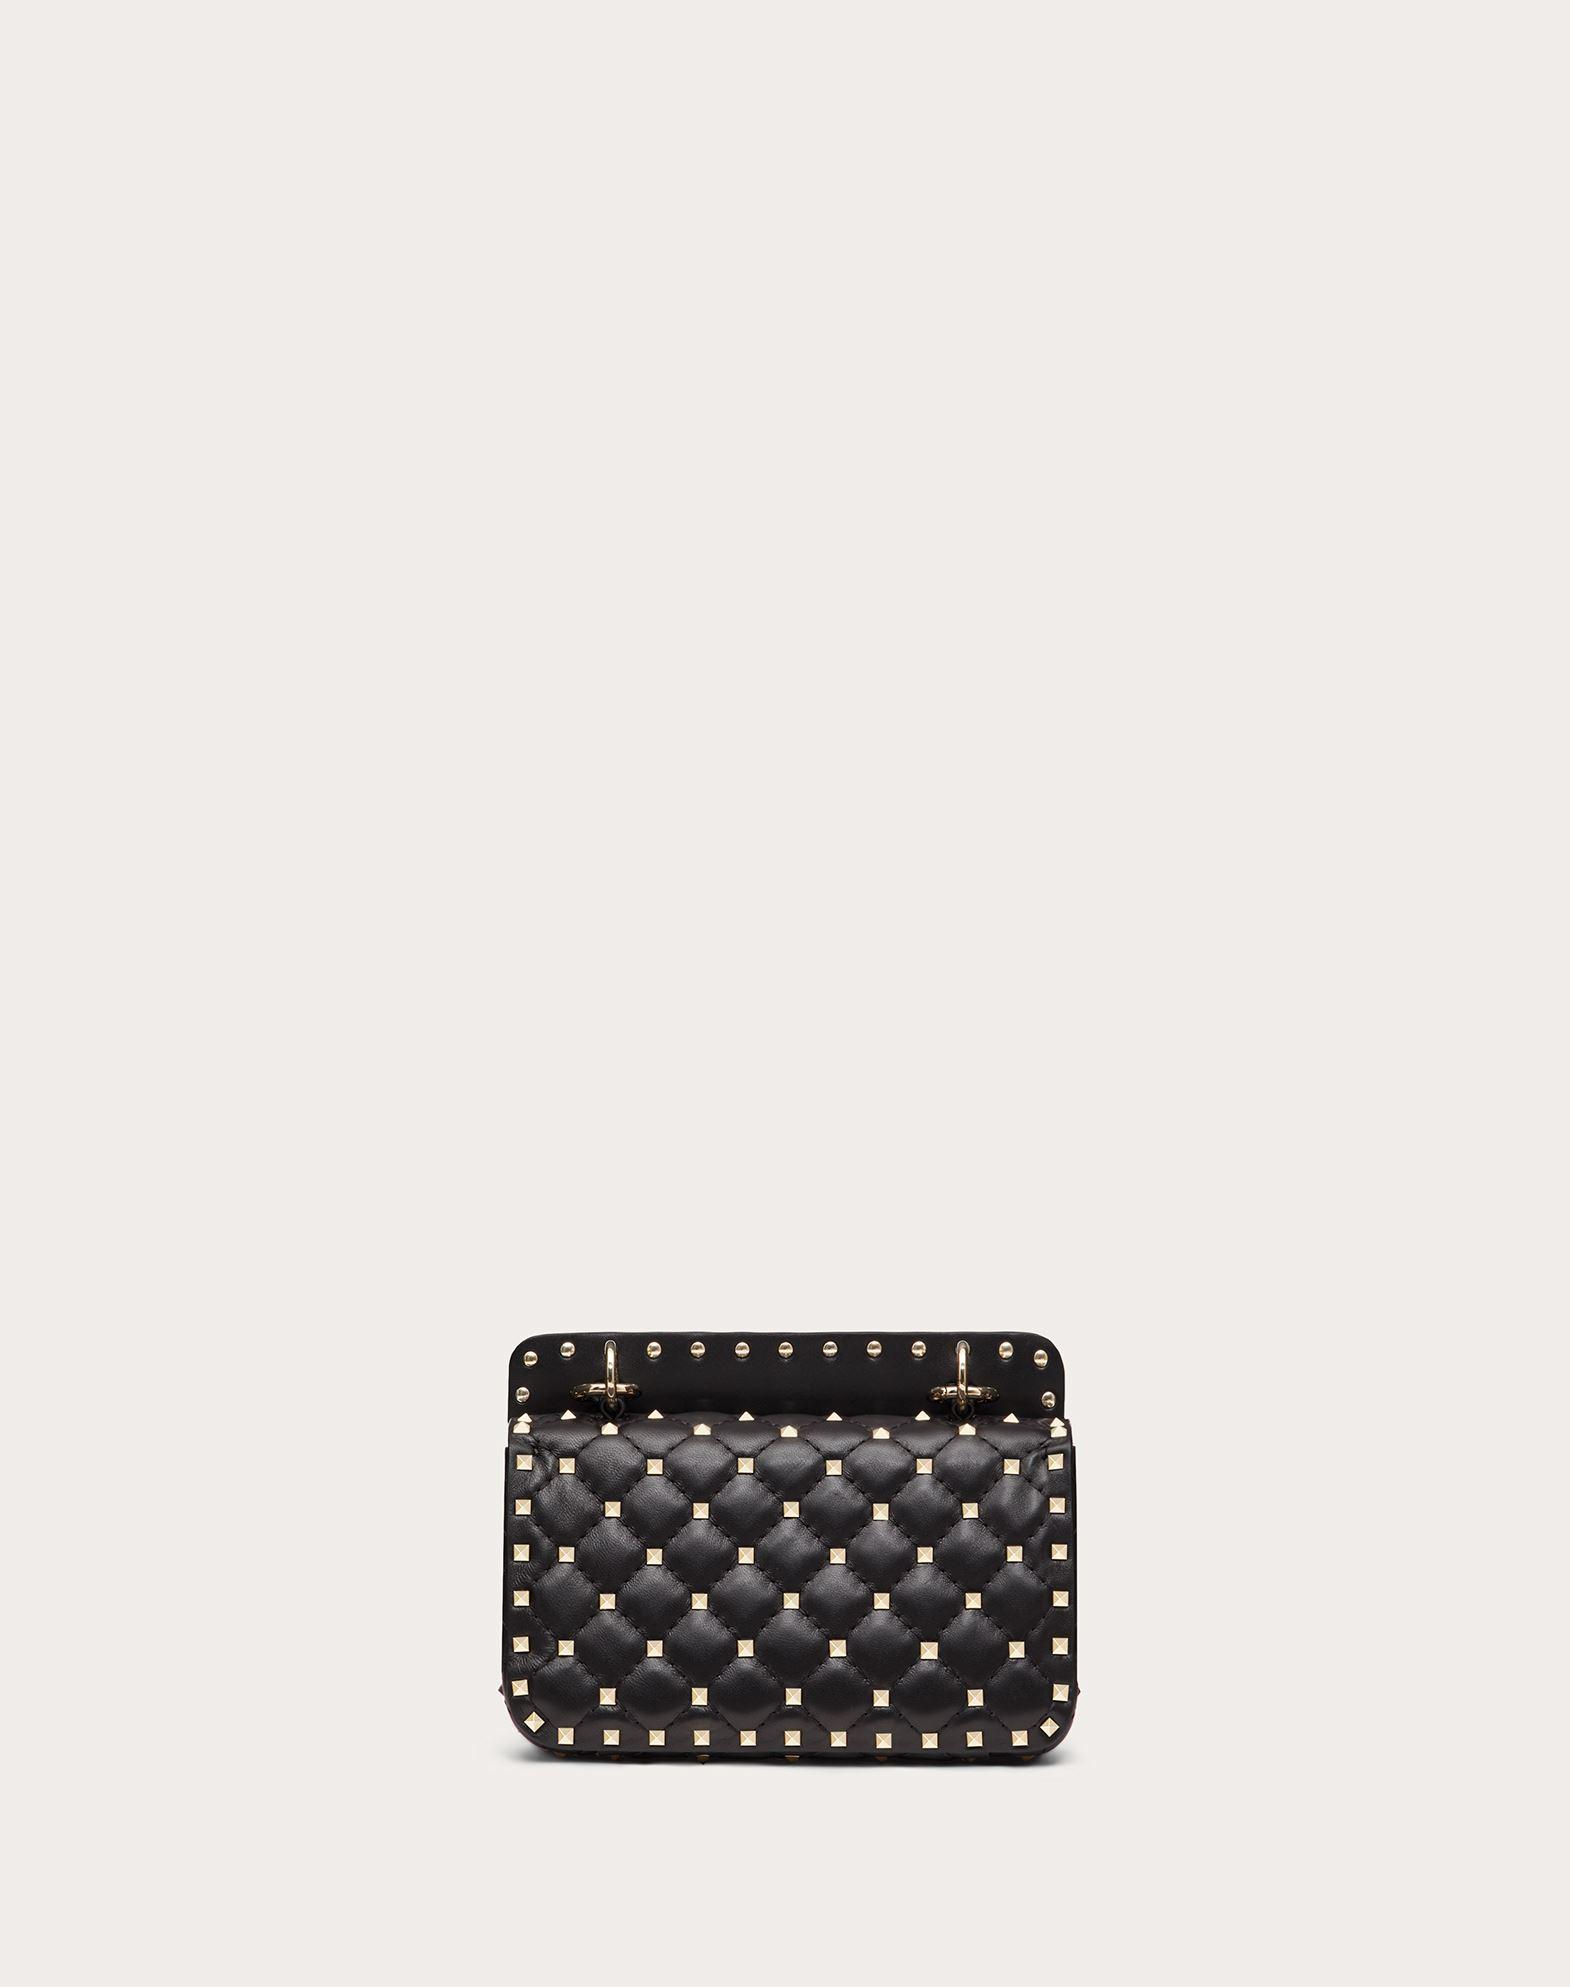 VALENTINO GARAVANI Rockstud Spike Small Chain Bag Shoulder bag D e